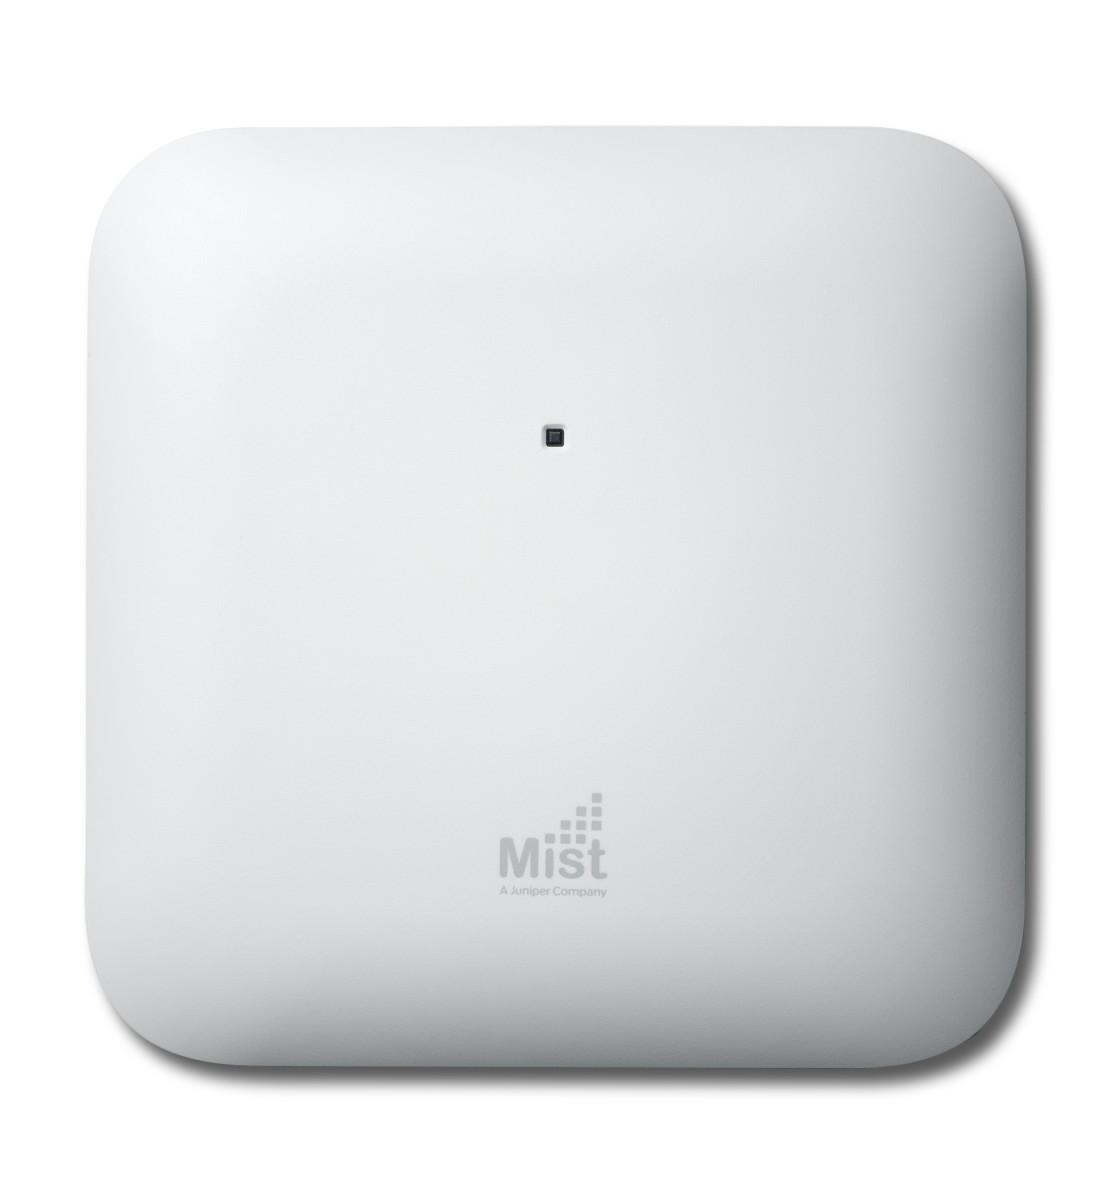 Mist AP43 集齊網絡保證(Wi-Fi Assurance)、虛擬助手Marvis、流動設備互動(Mobile Engagement)及檢視資 產(Asset Visibility)功 能,無論是支援、體驗、資源等都能得到有效處理,令管理無線網絡工作變得輕鬆簡單。